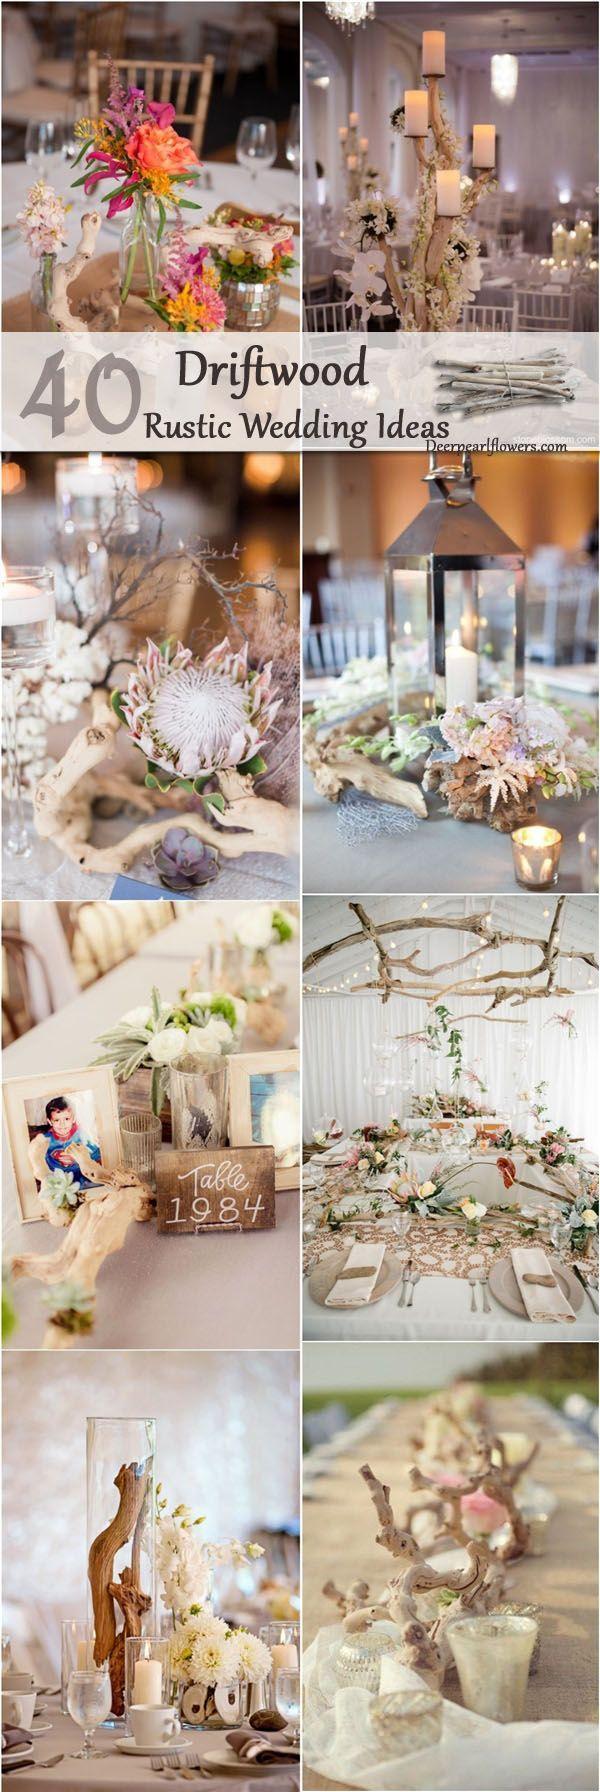 Decor ideas for wedding   best Wedding ideas images on Pinterest  Weddings Dream wedding